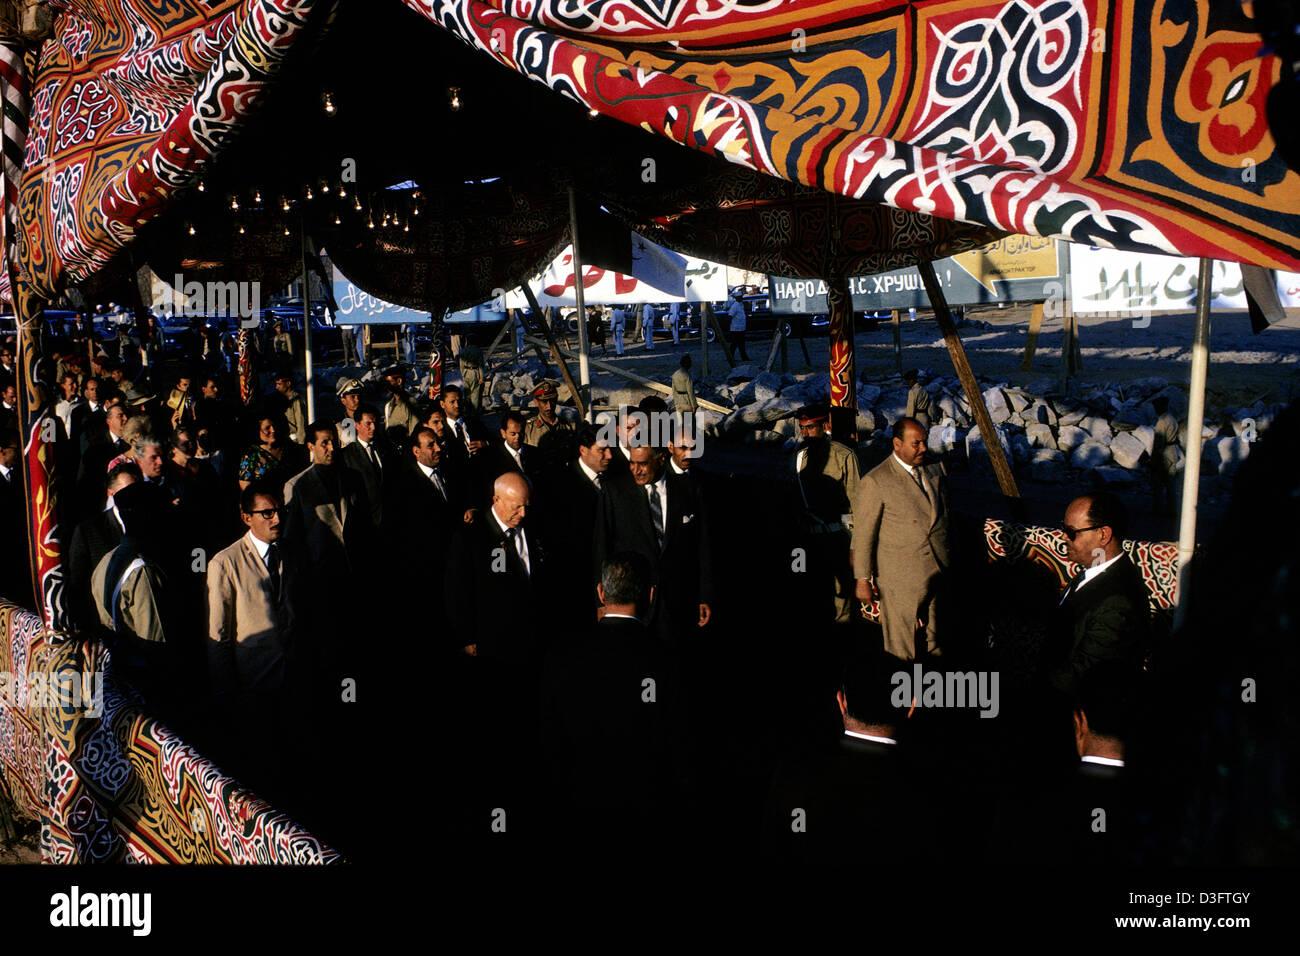 Nikita Kruschev and Gamal Abdel Nasser inauguration the Aswan High Dam, Egypt in 1964. - Stock Image